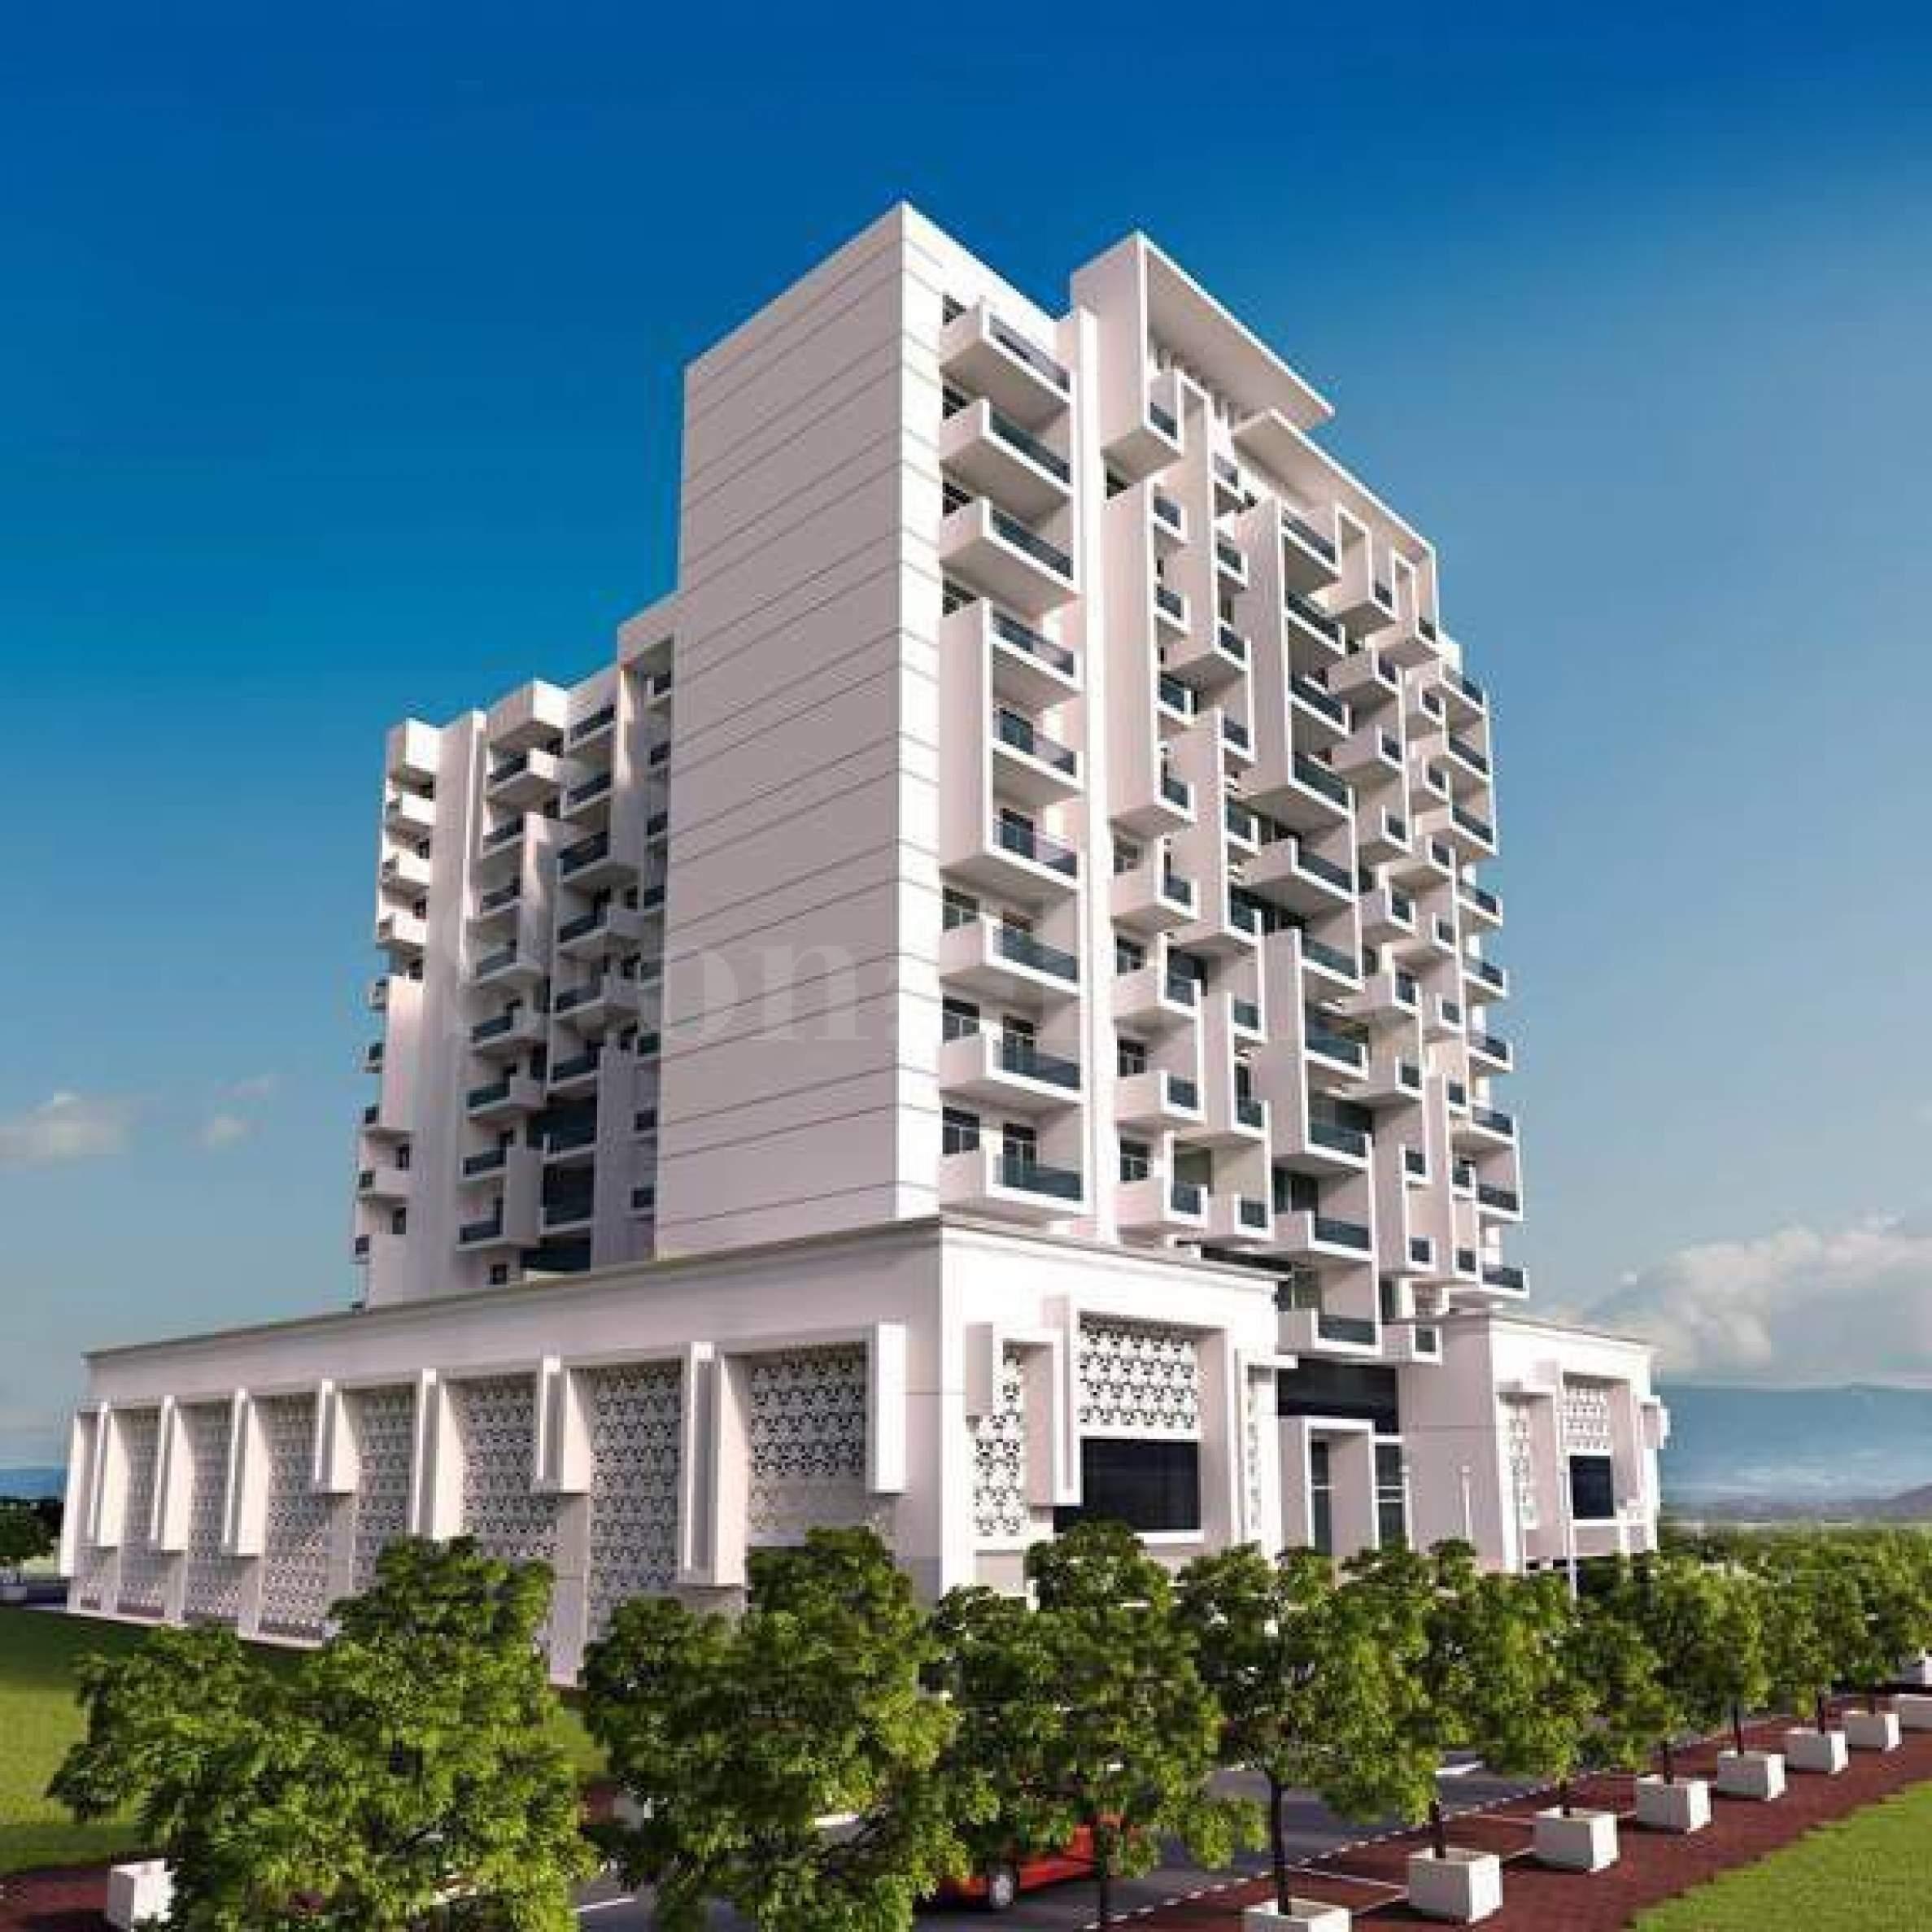 Serviced apartments in Al Furjan business district1 - Stonehard